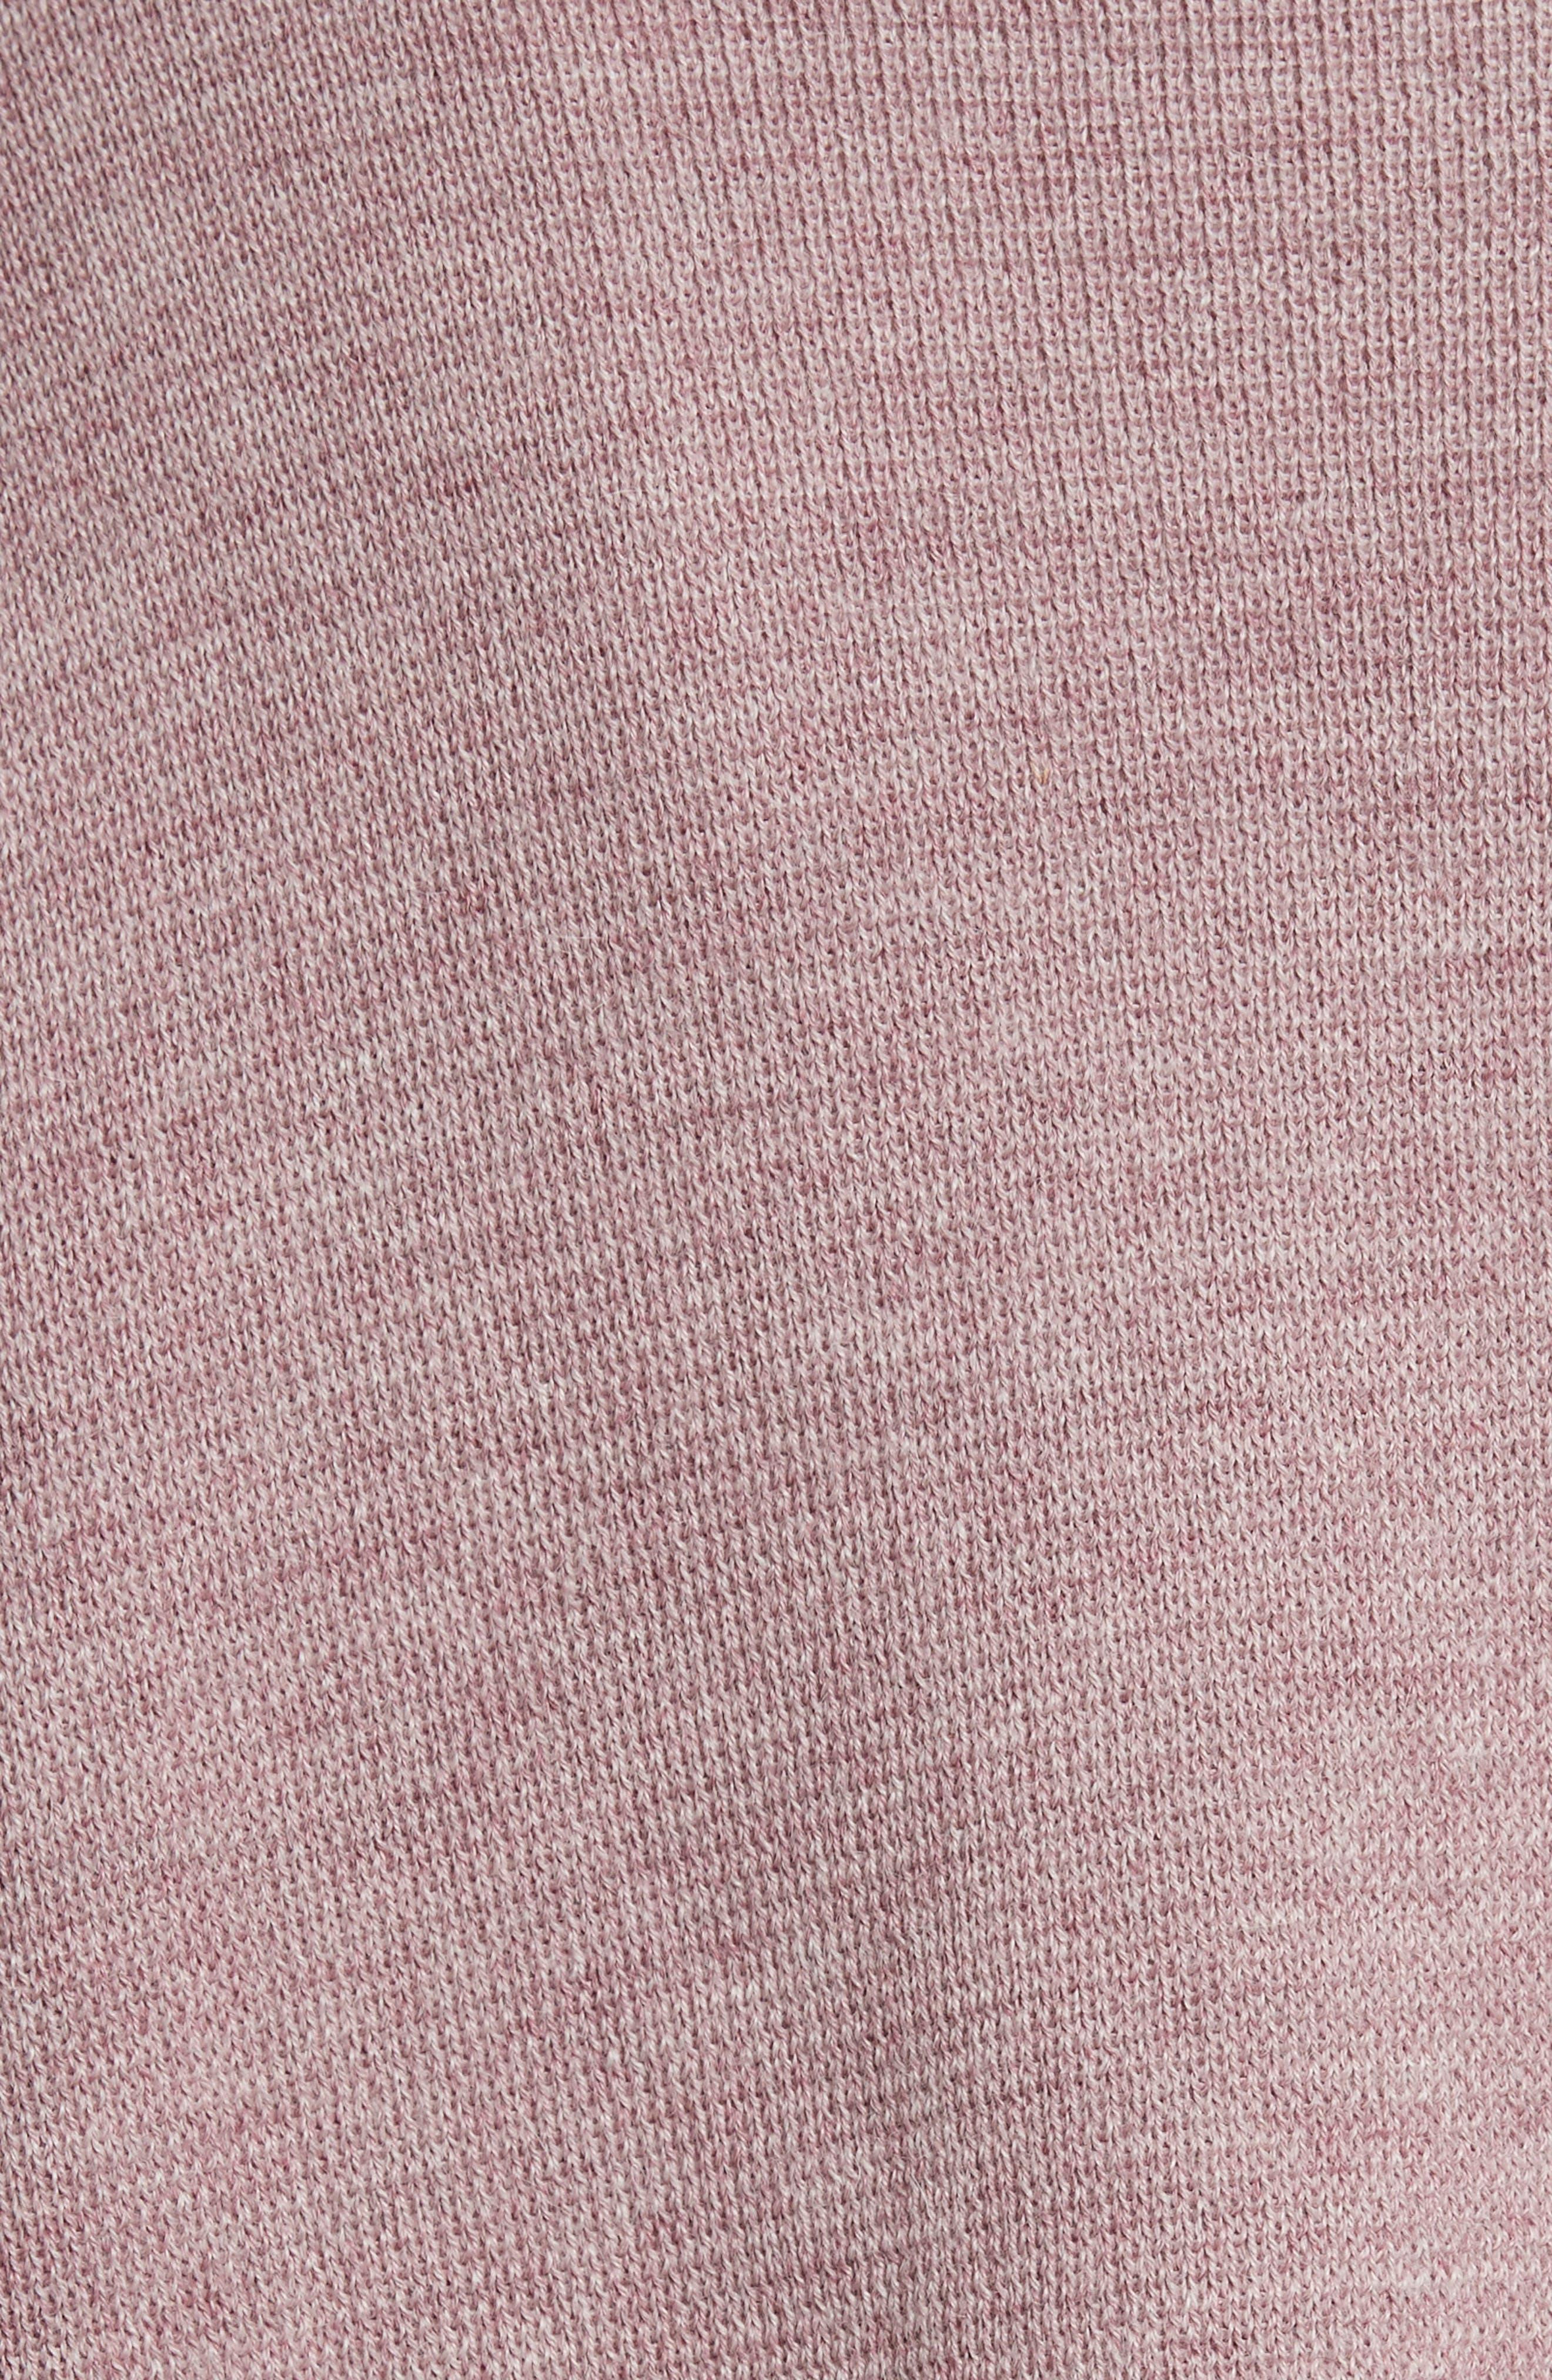 Fount Alpaca Hair Sweater,                             Alternate thumbnail 5, color,                             Lilac